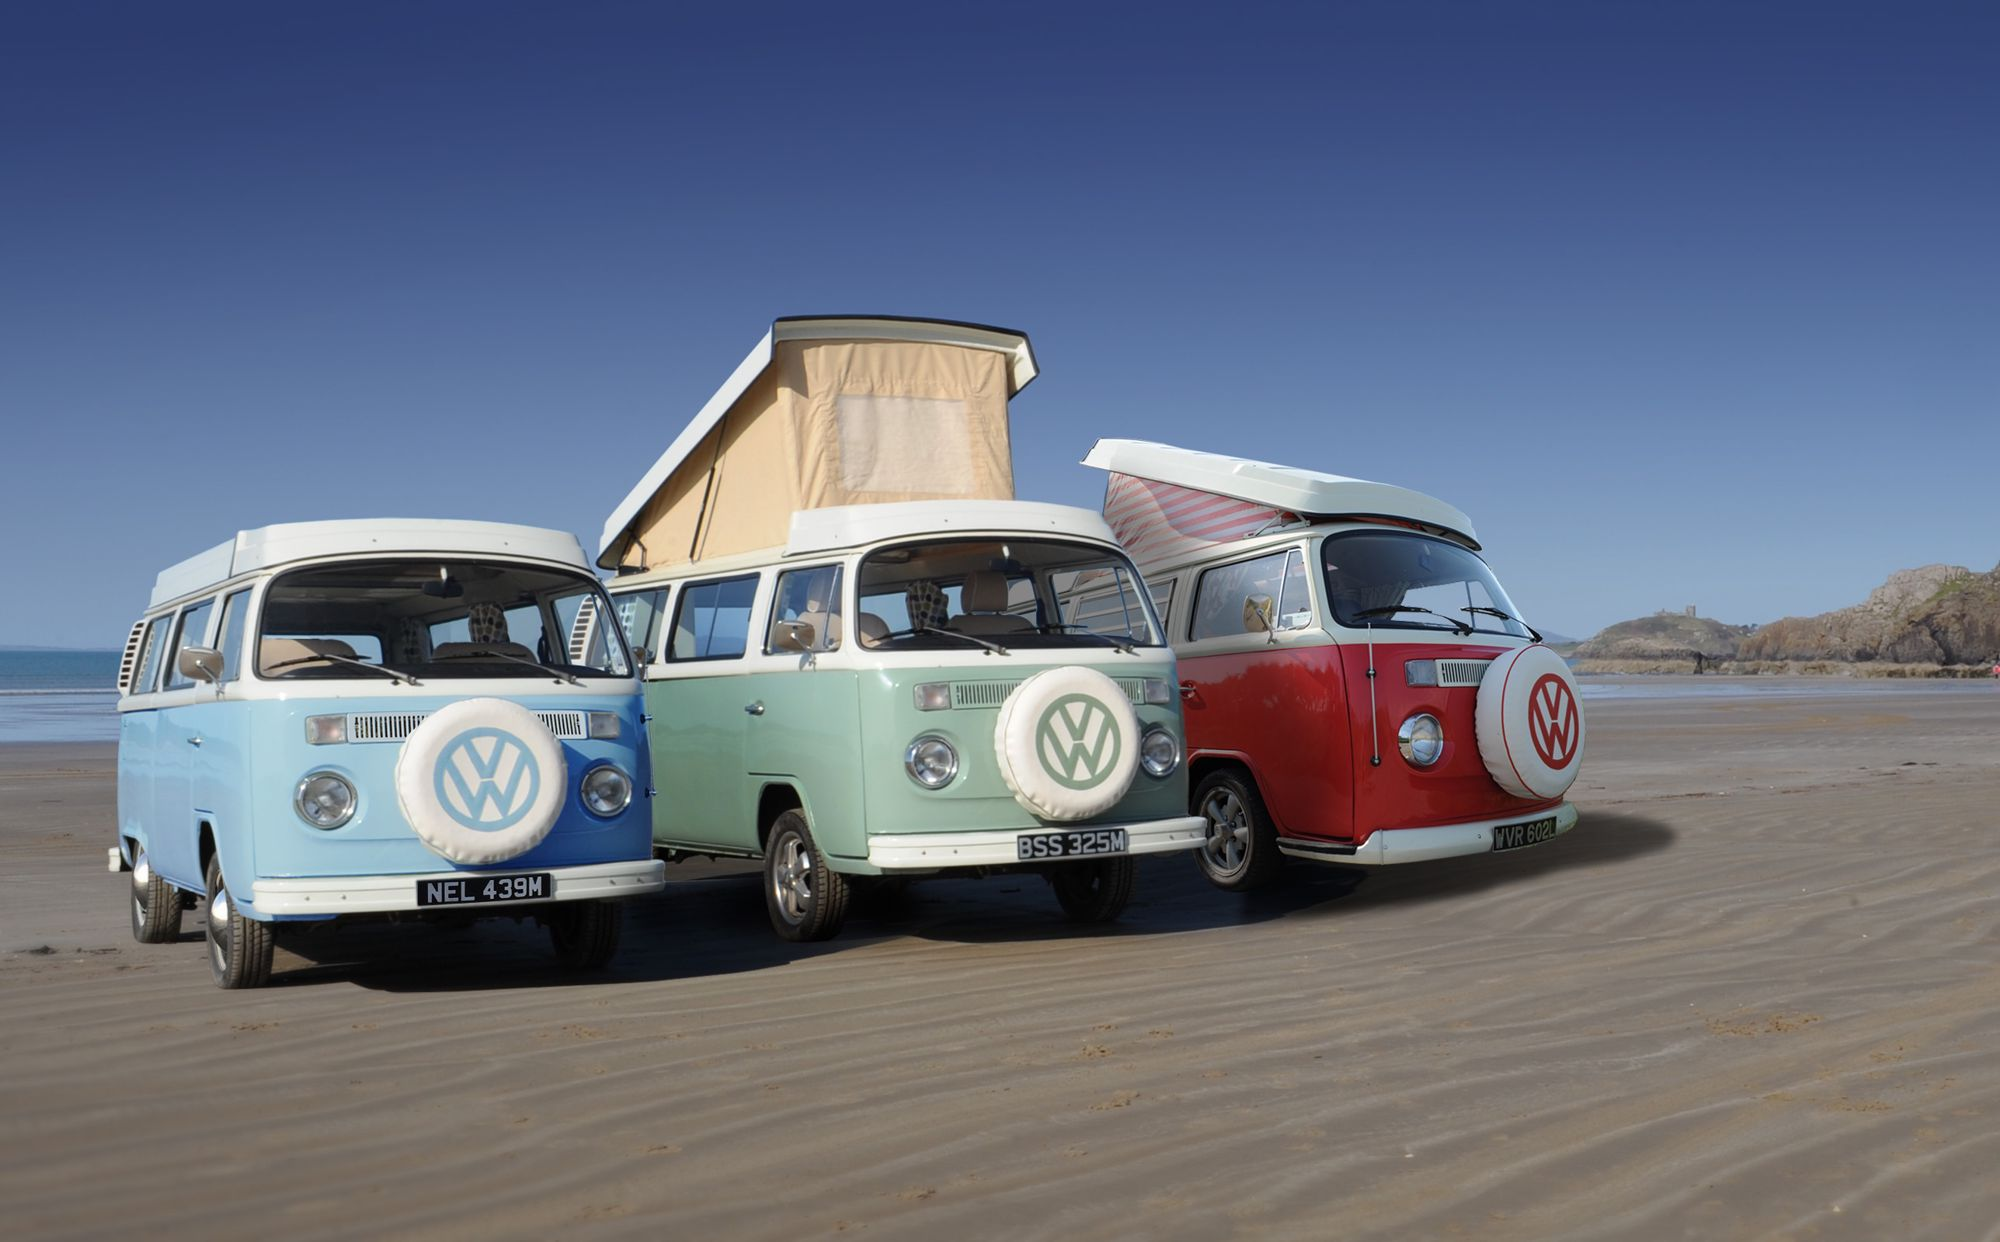 Campervan Hire and Motorhome Rental in Porthmadog – Cool Camping